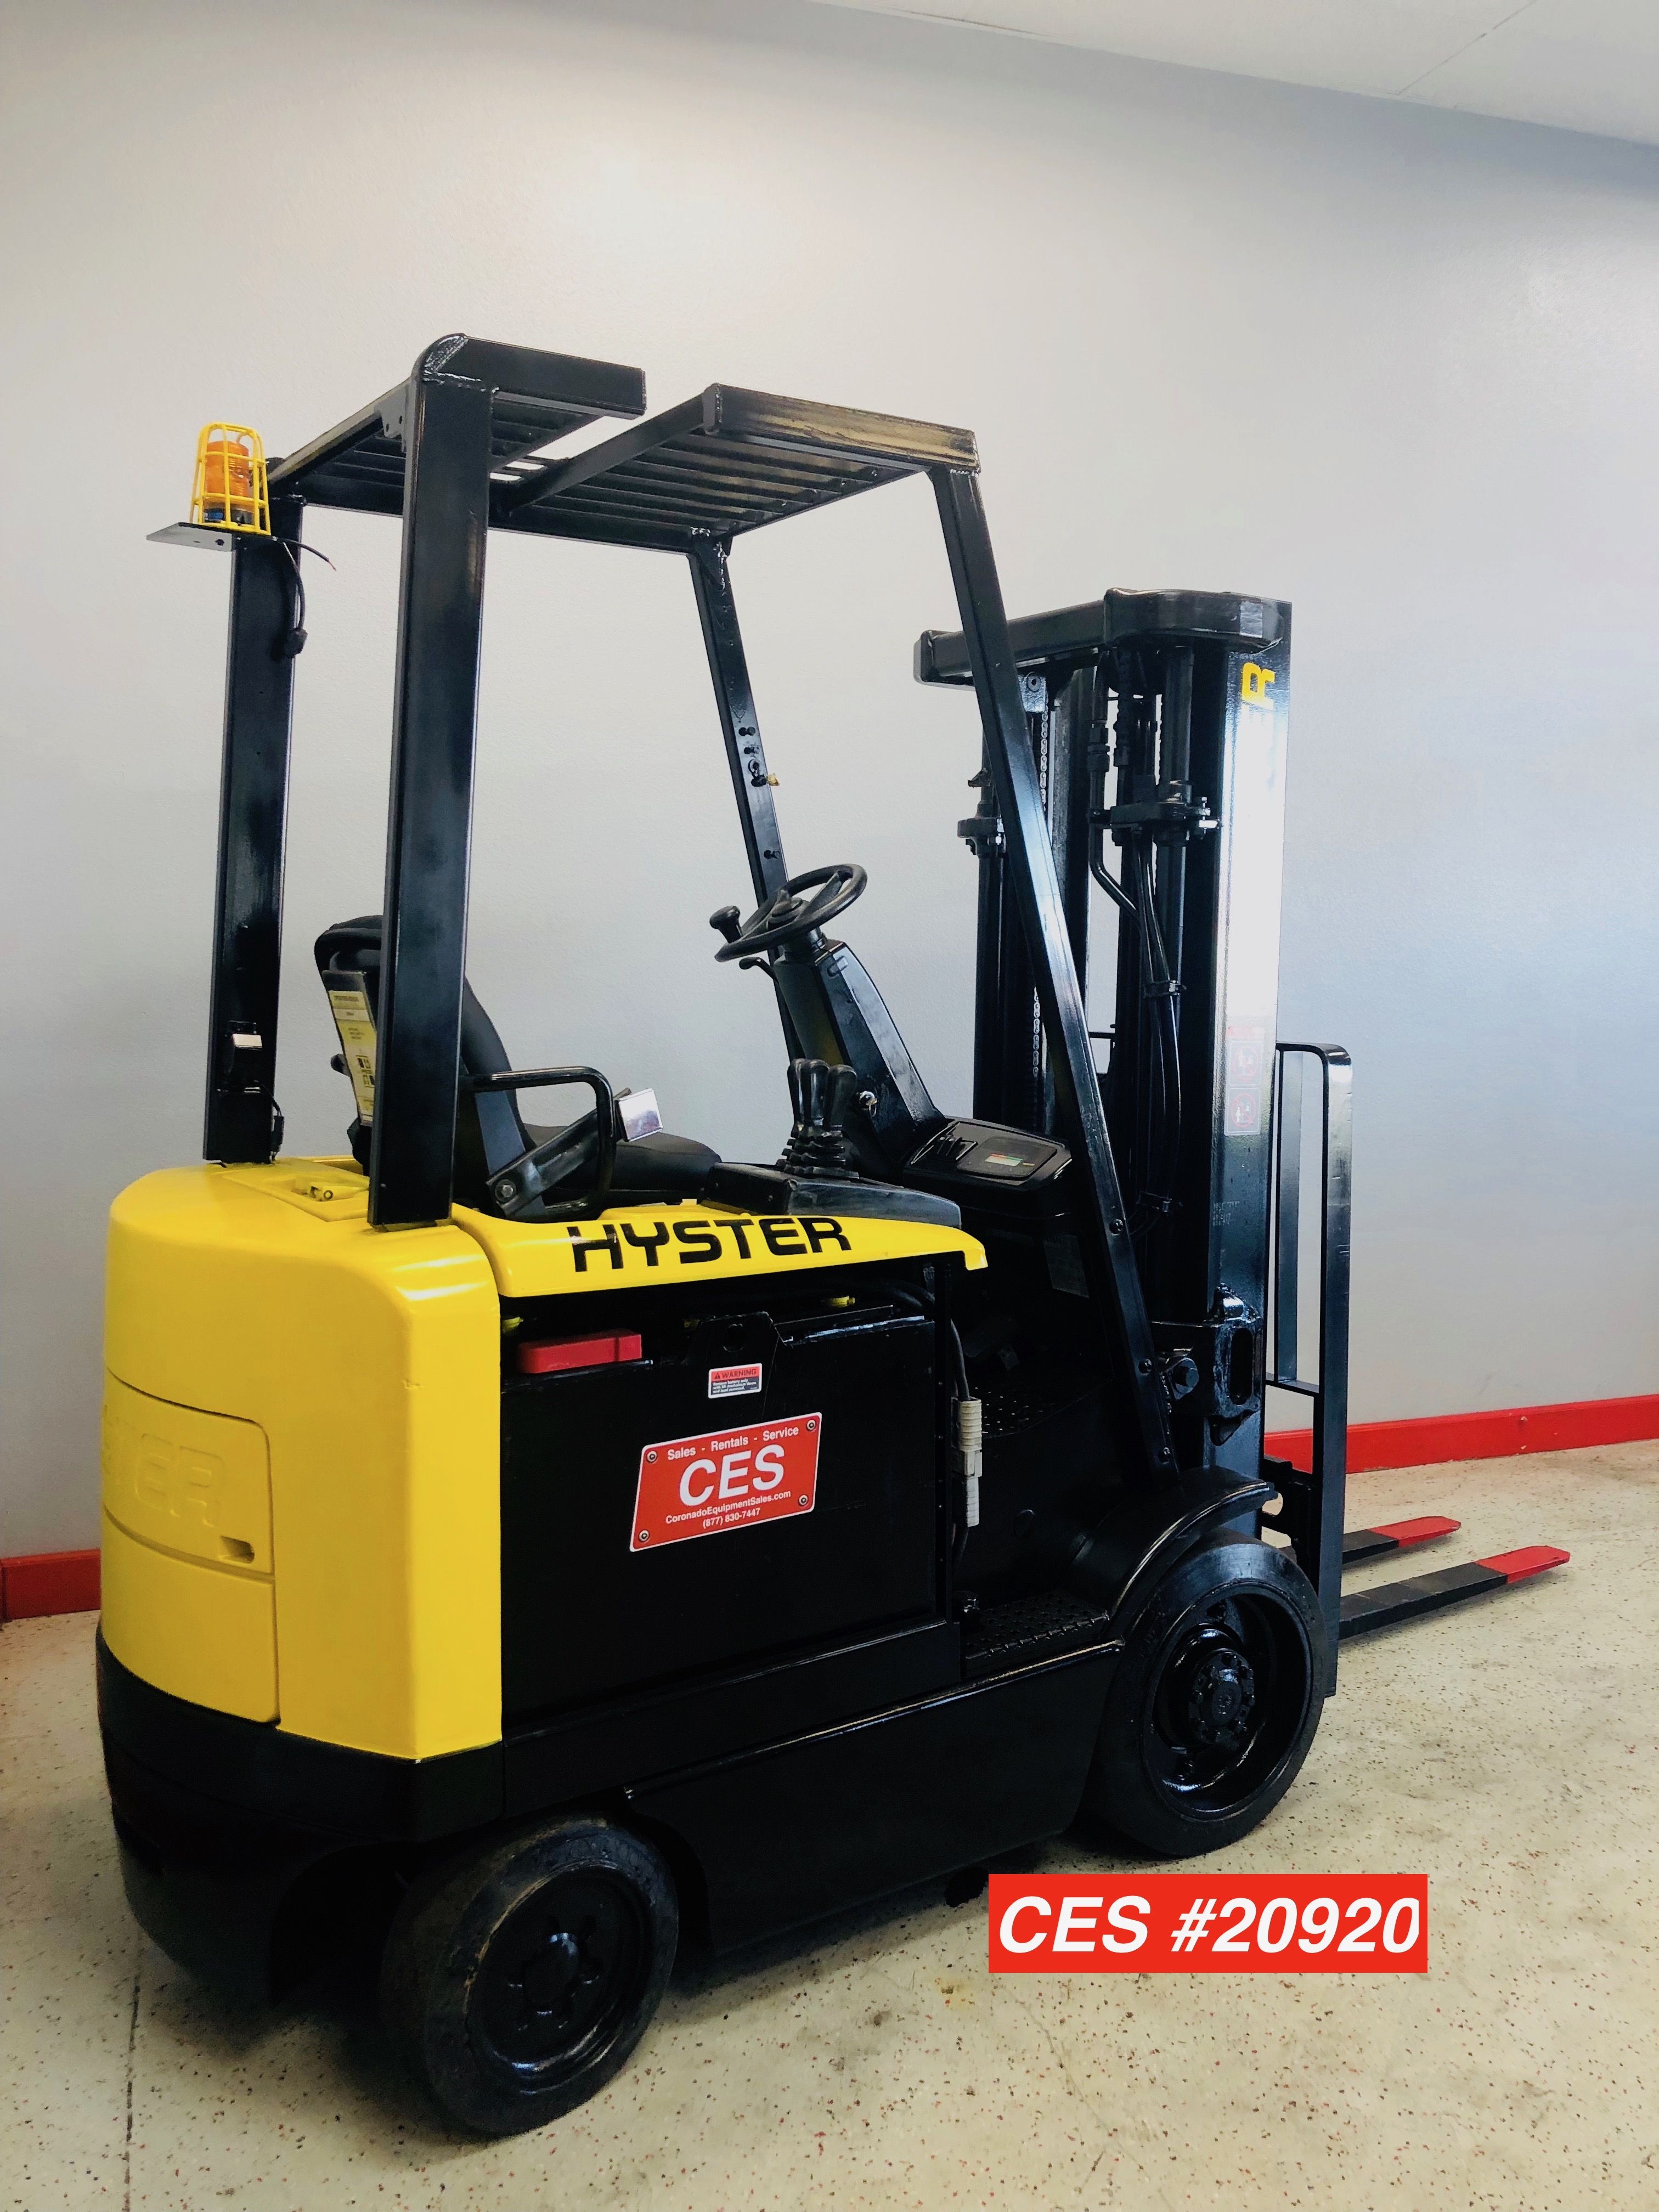 Ces 20920 Hyster E50z 27 Electric Forklift Coronado